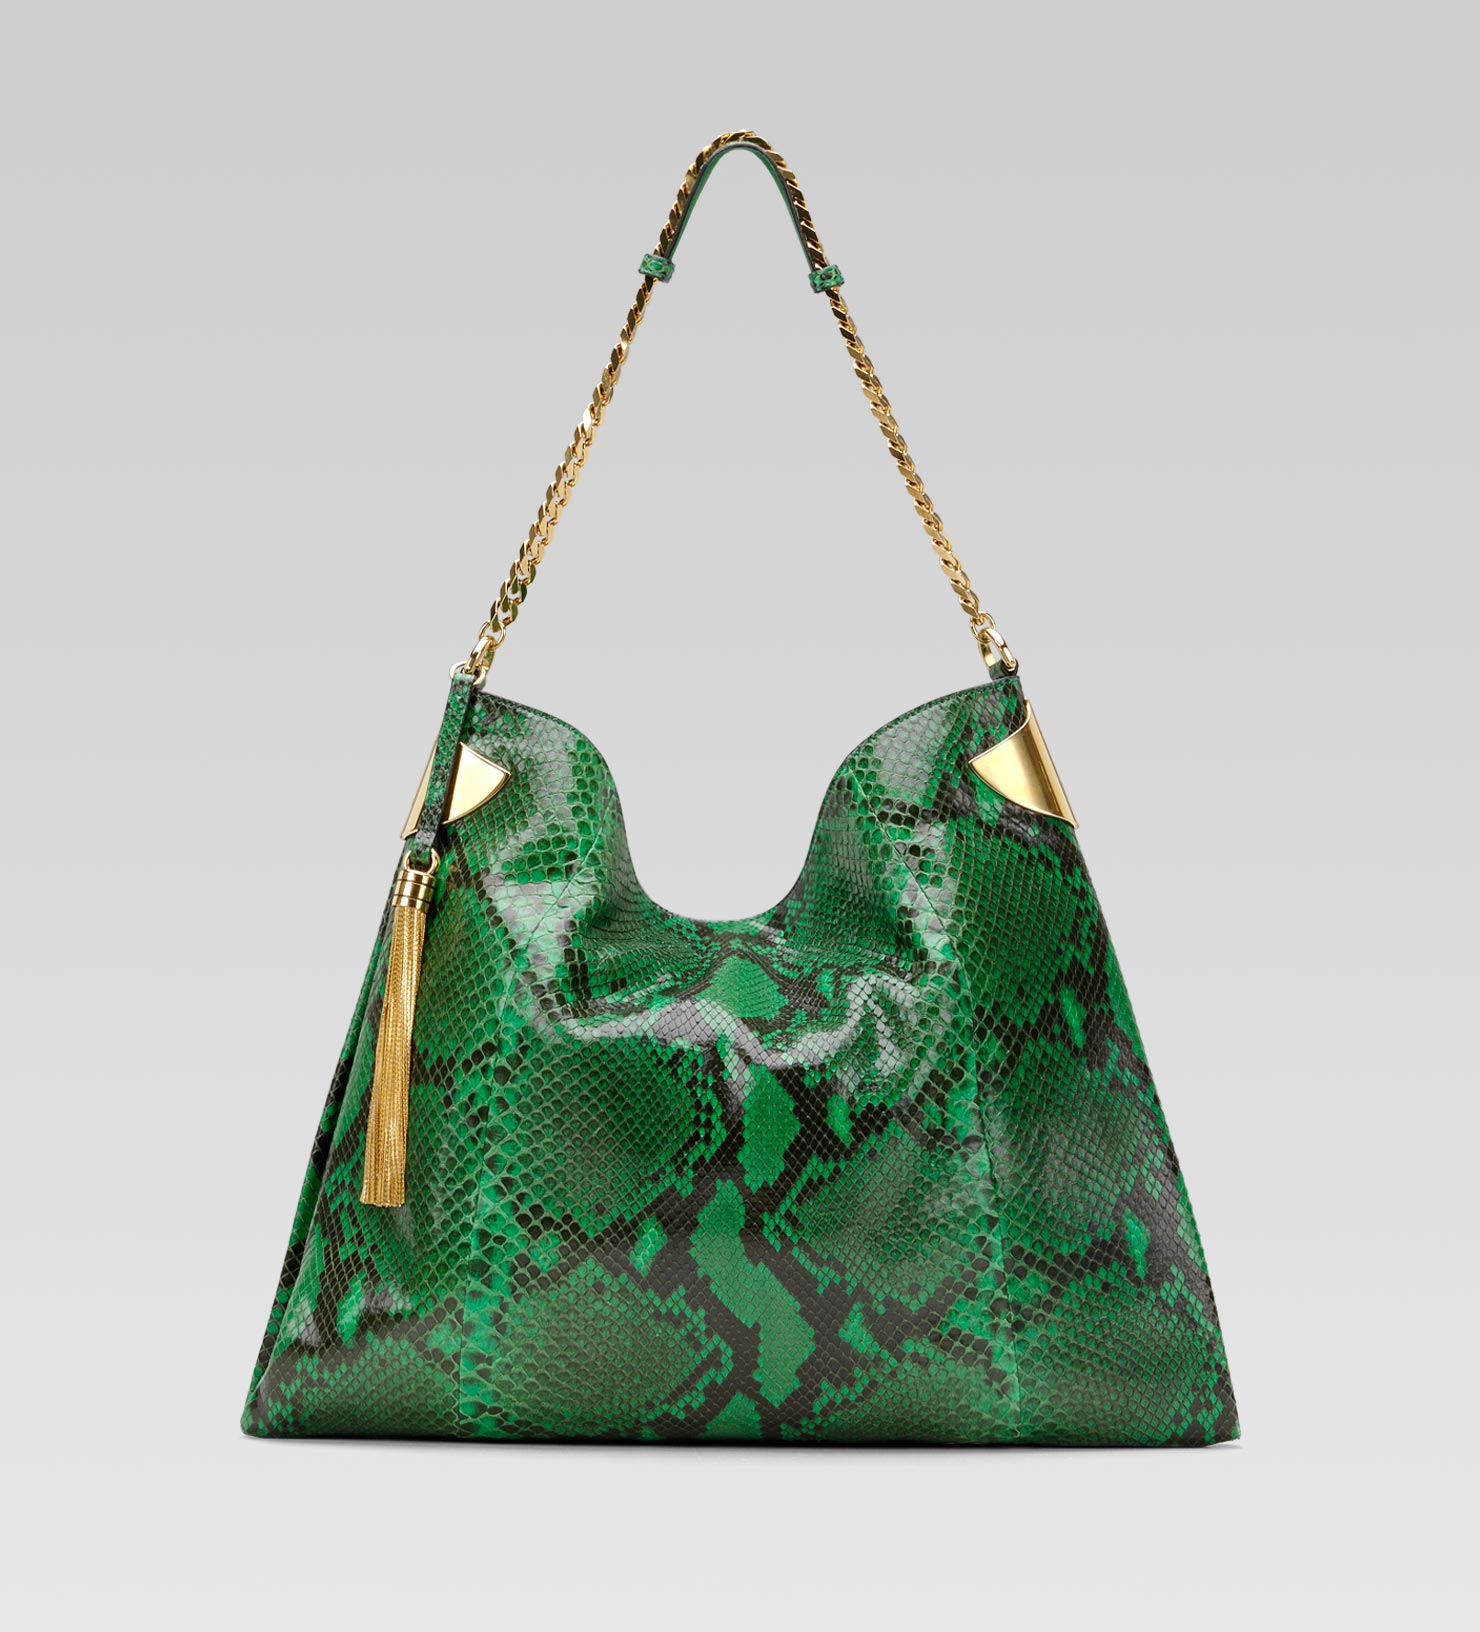 Gucci-gucci-1970-large-shoulder-bag-1